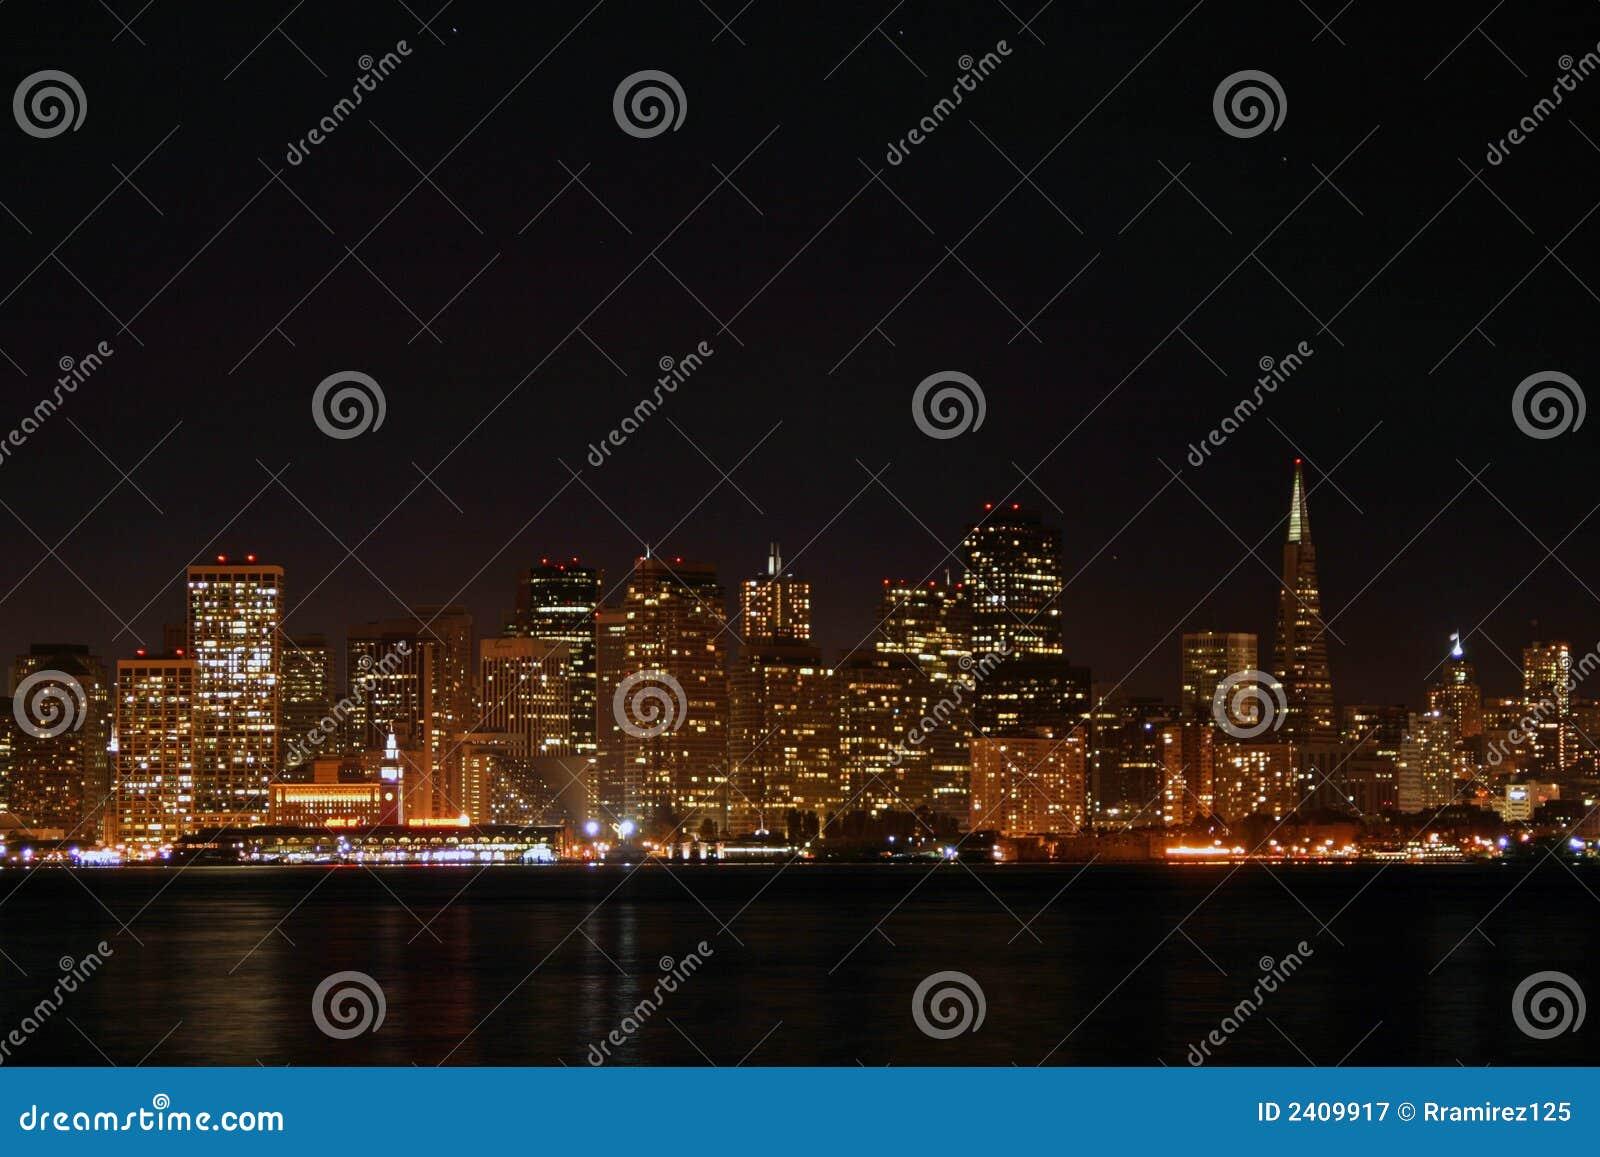 SF Skyline at night